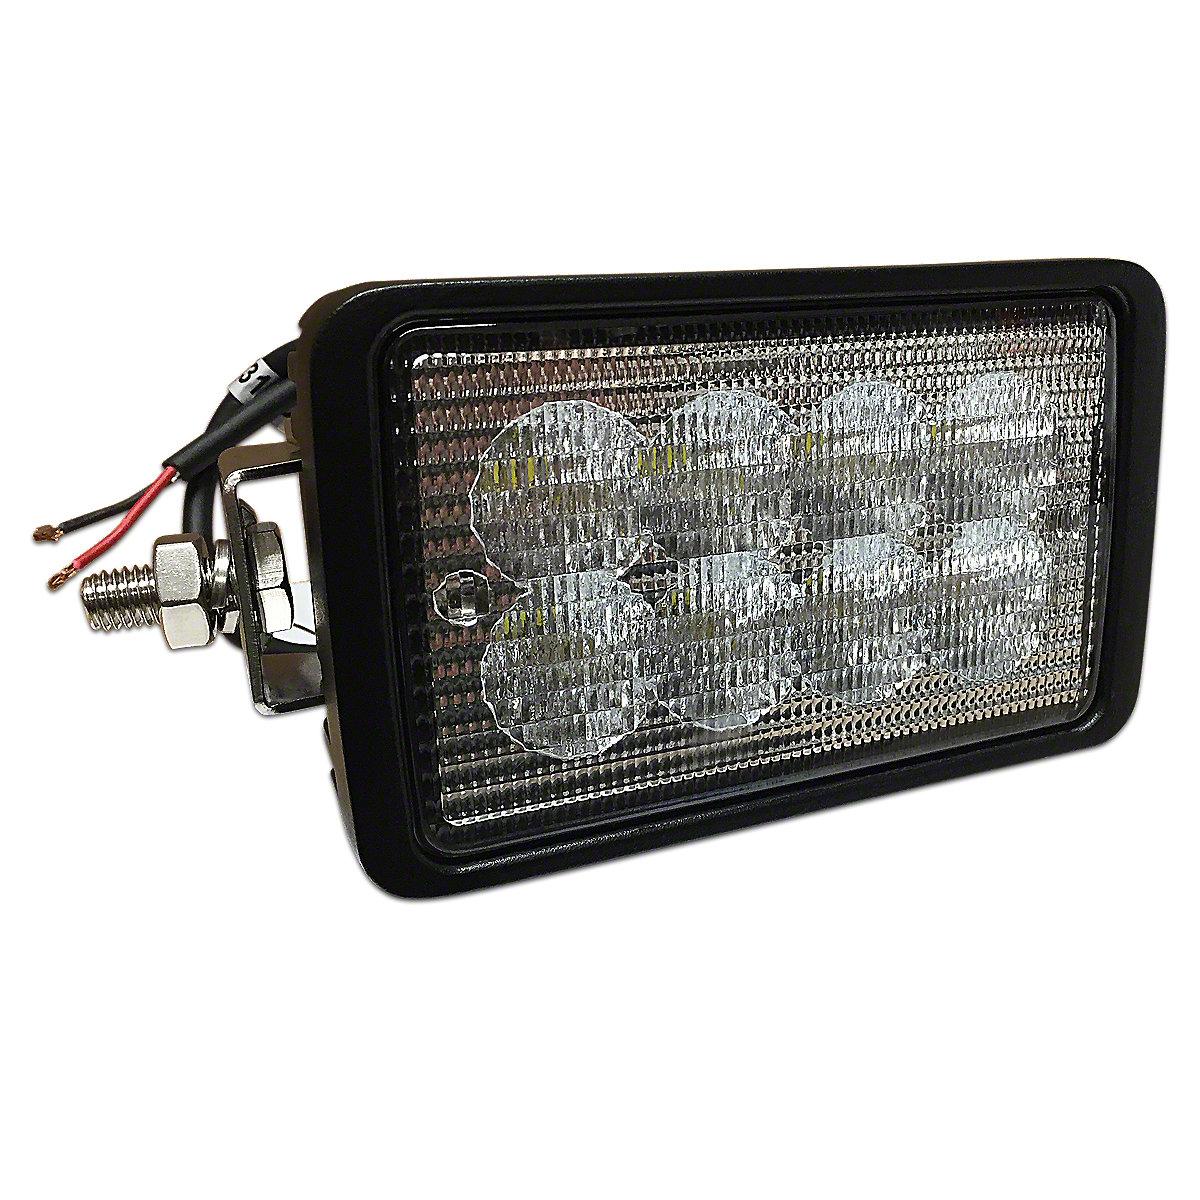 ABC4130LED Front / Rear Cab Light